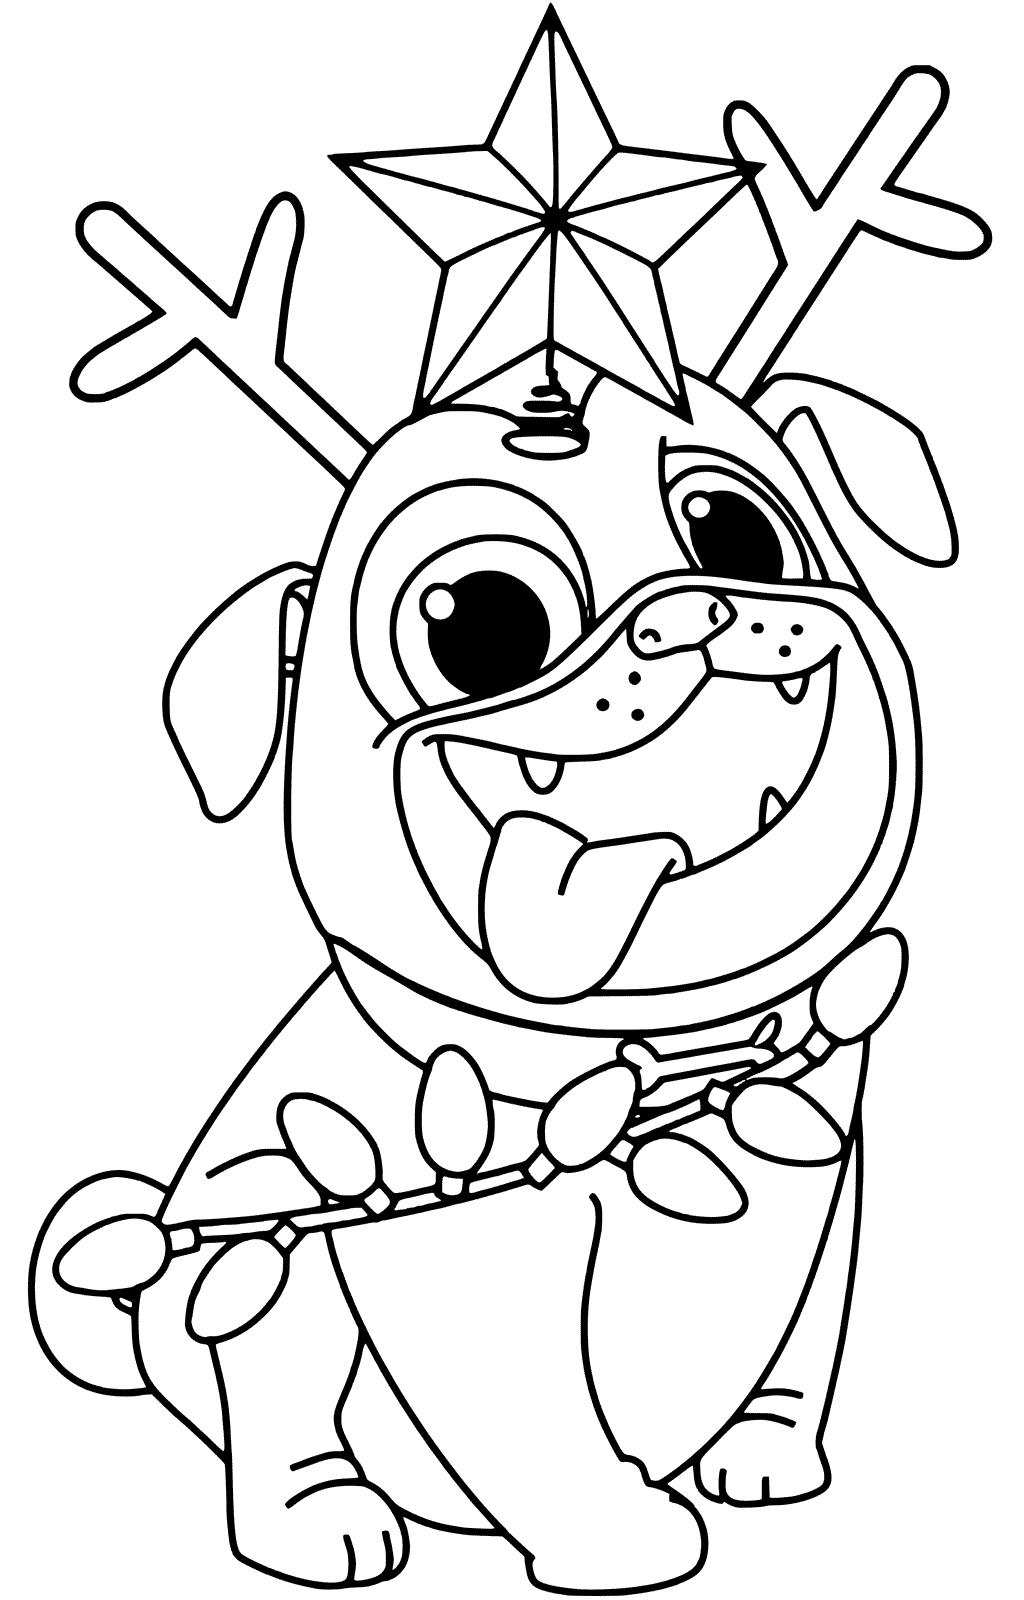 free dog coloring sheets dog coloring pages 2018 dr odd coloring dog free sheets